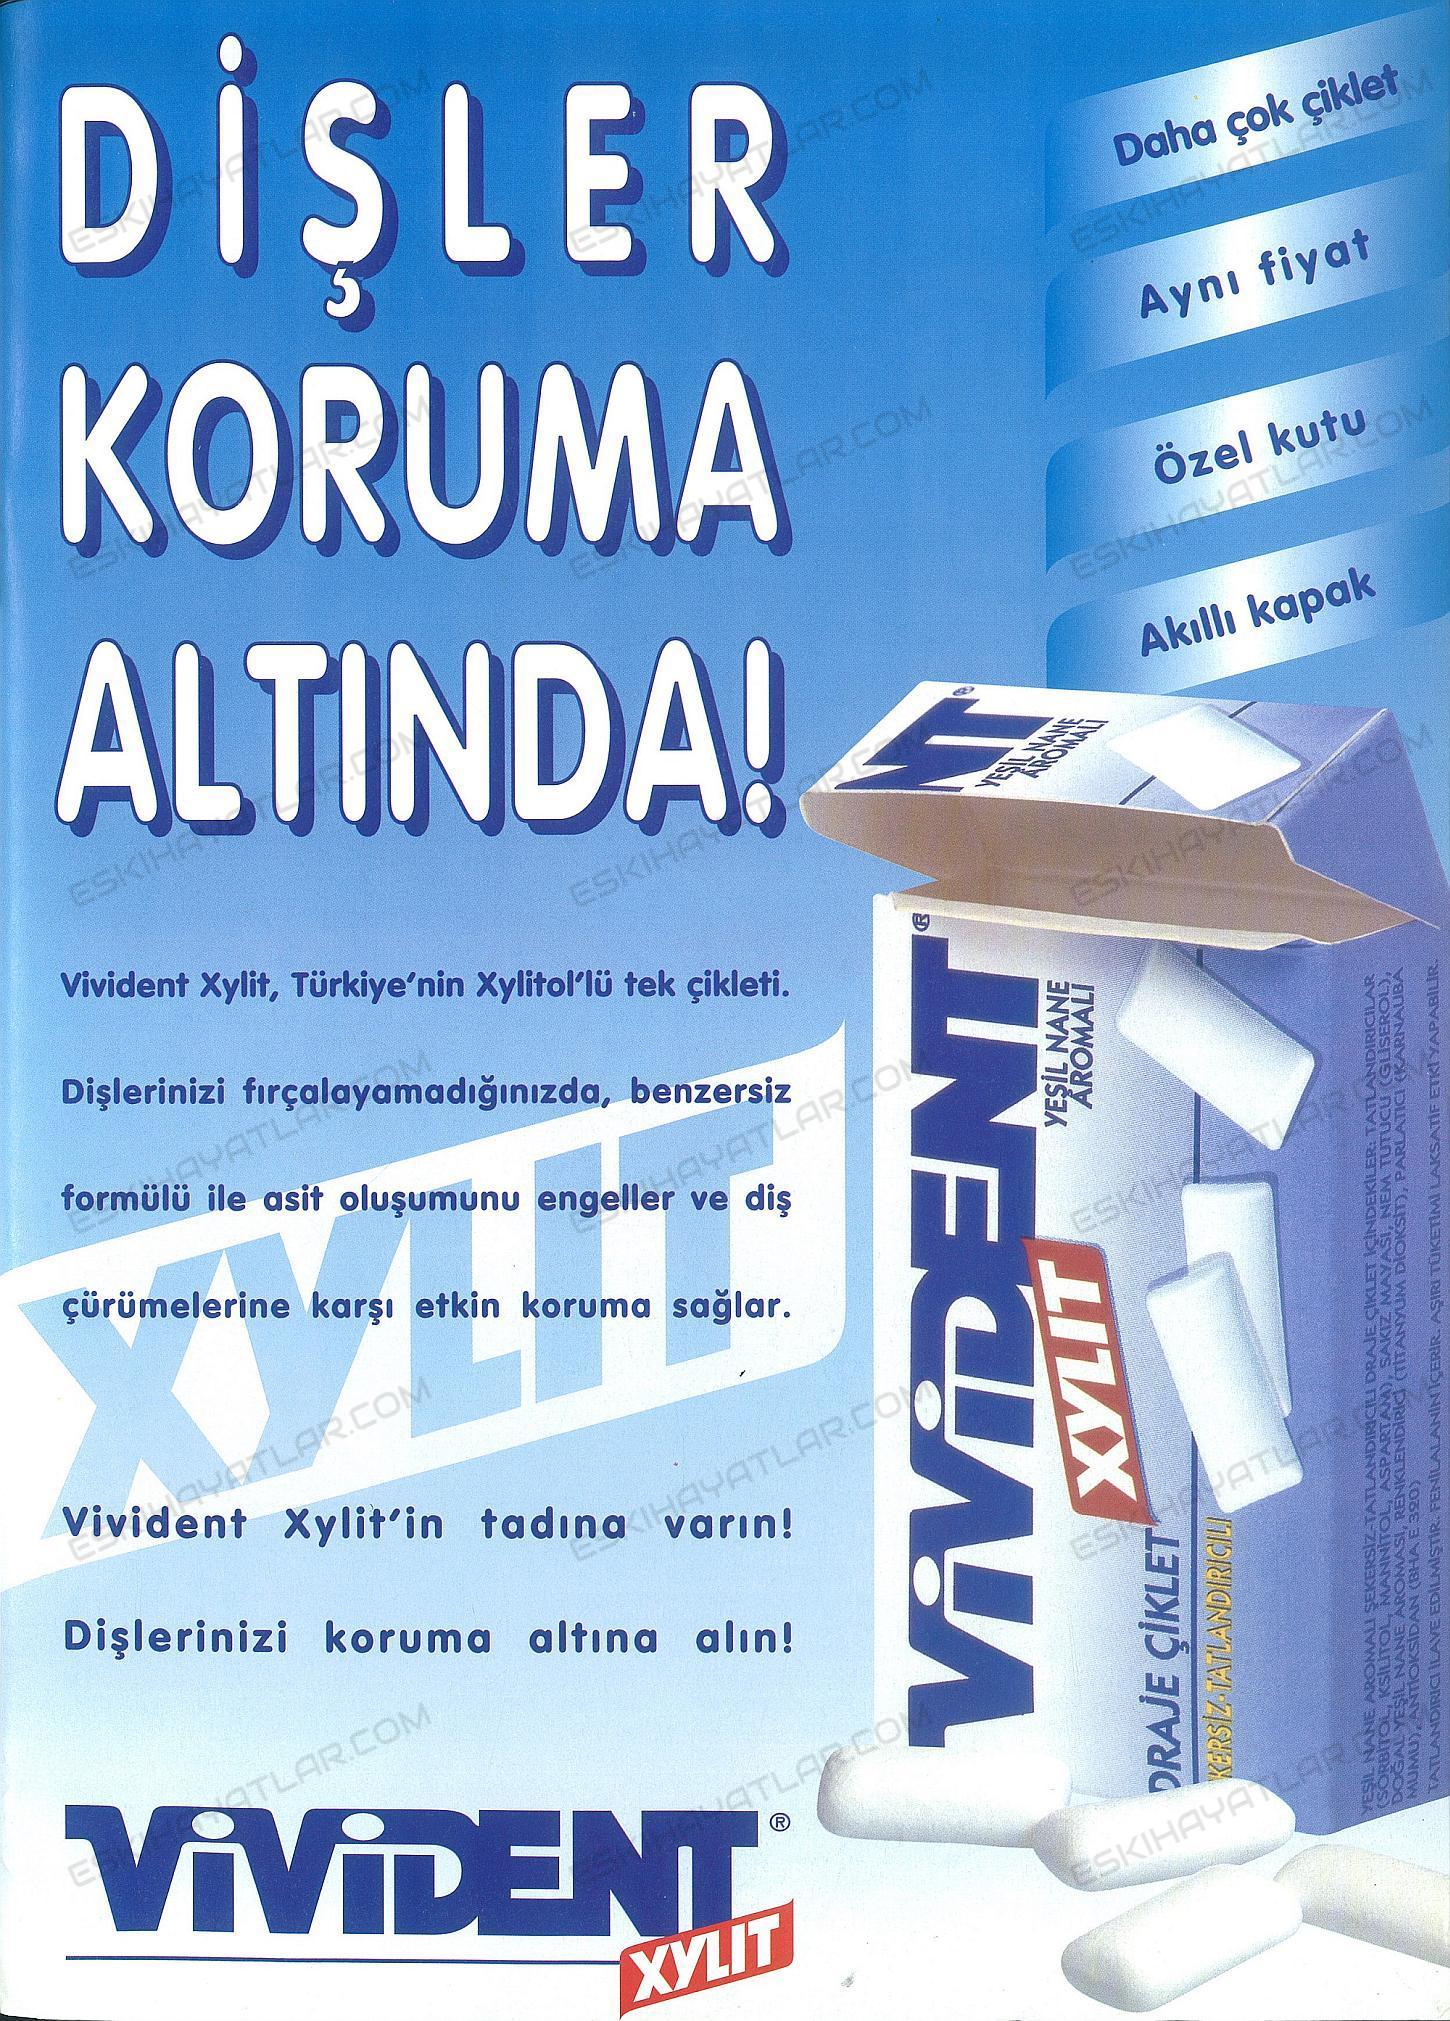 0502-vivident-xylit-disler-koruma-altinda-1999-yilinda-sakiz-reklamlari-vivident-cigne-ve-gulumse